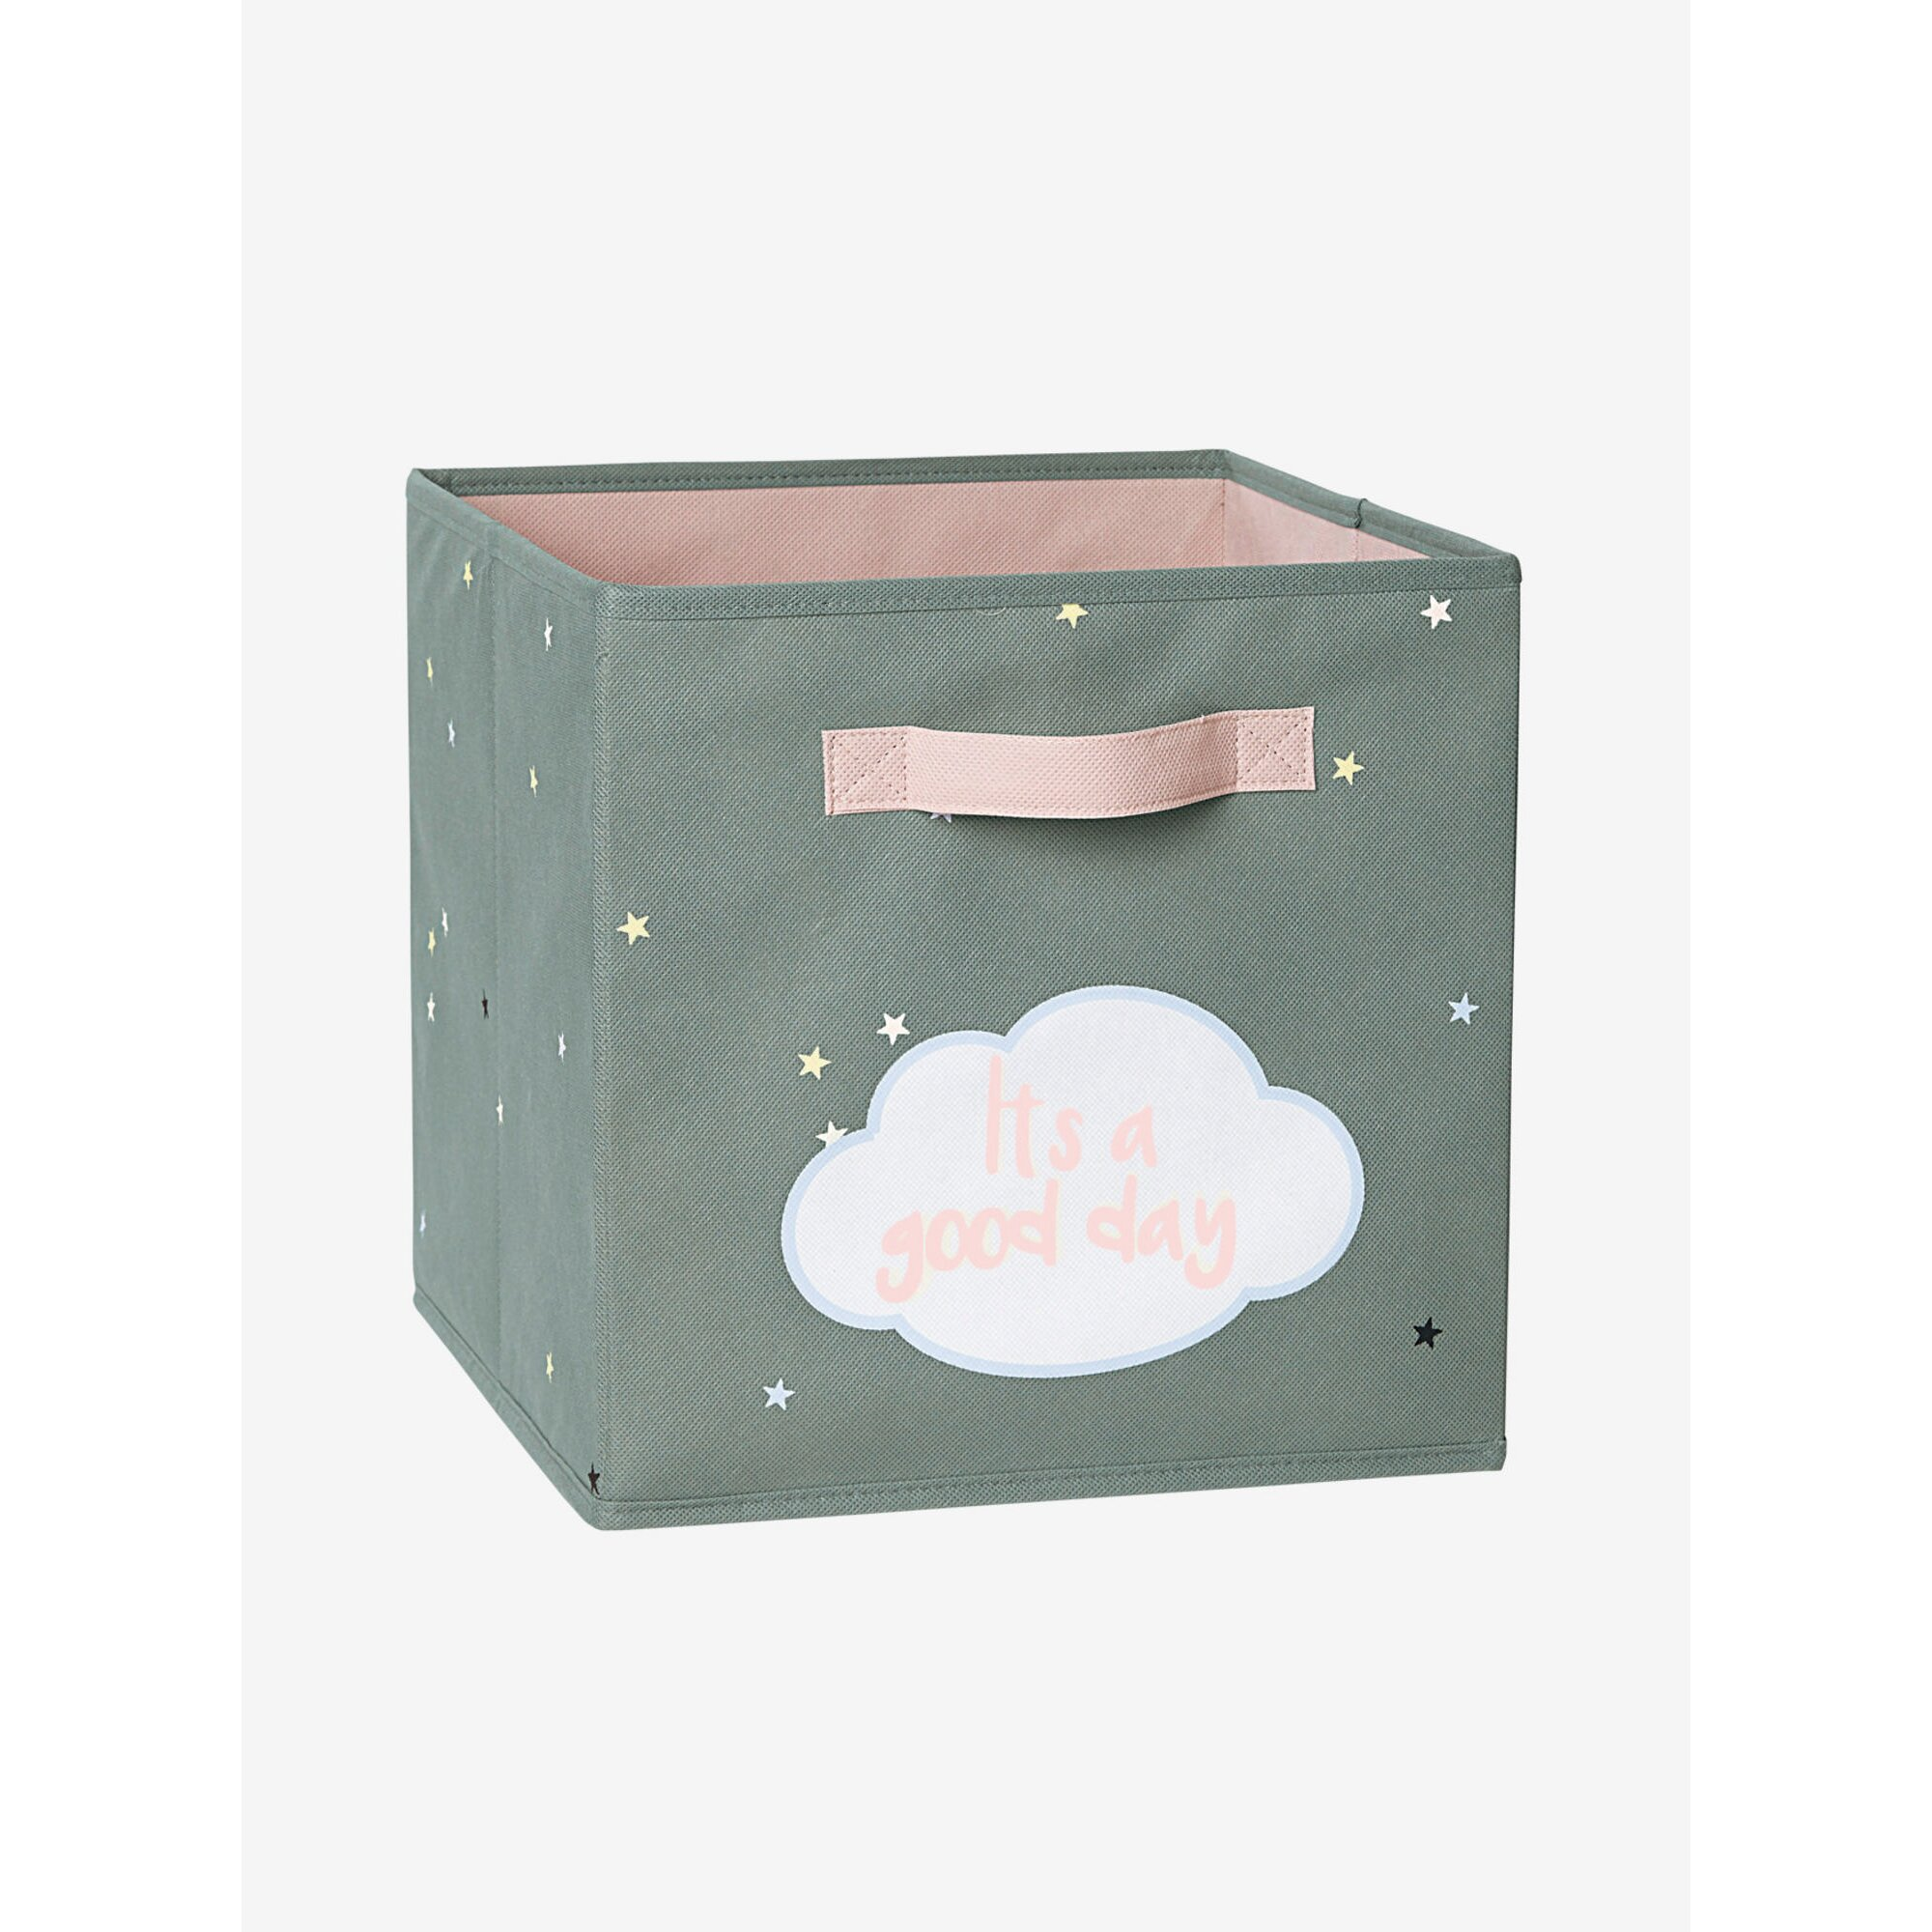 vertbaudet-2er-pack-aufbewahrungsboxen-stoff, 14.99 EUR @ babywalz-de